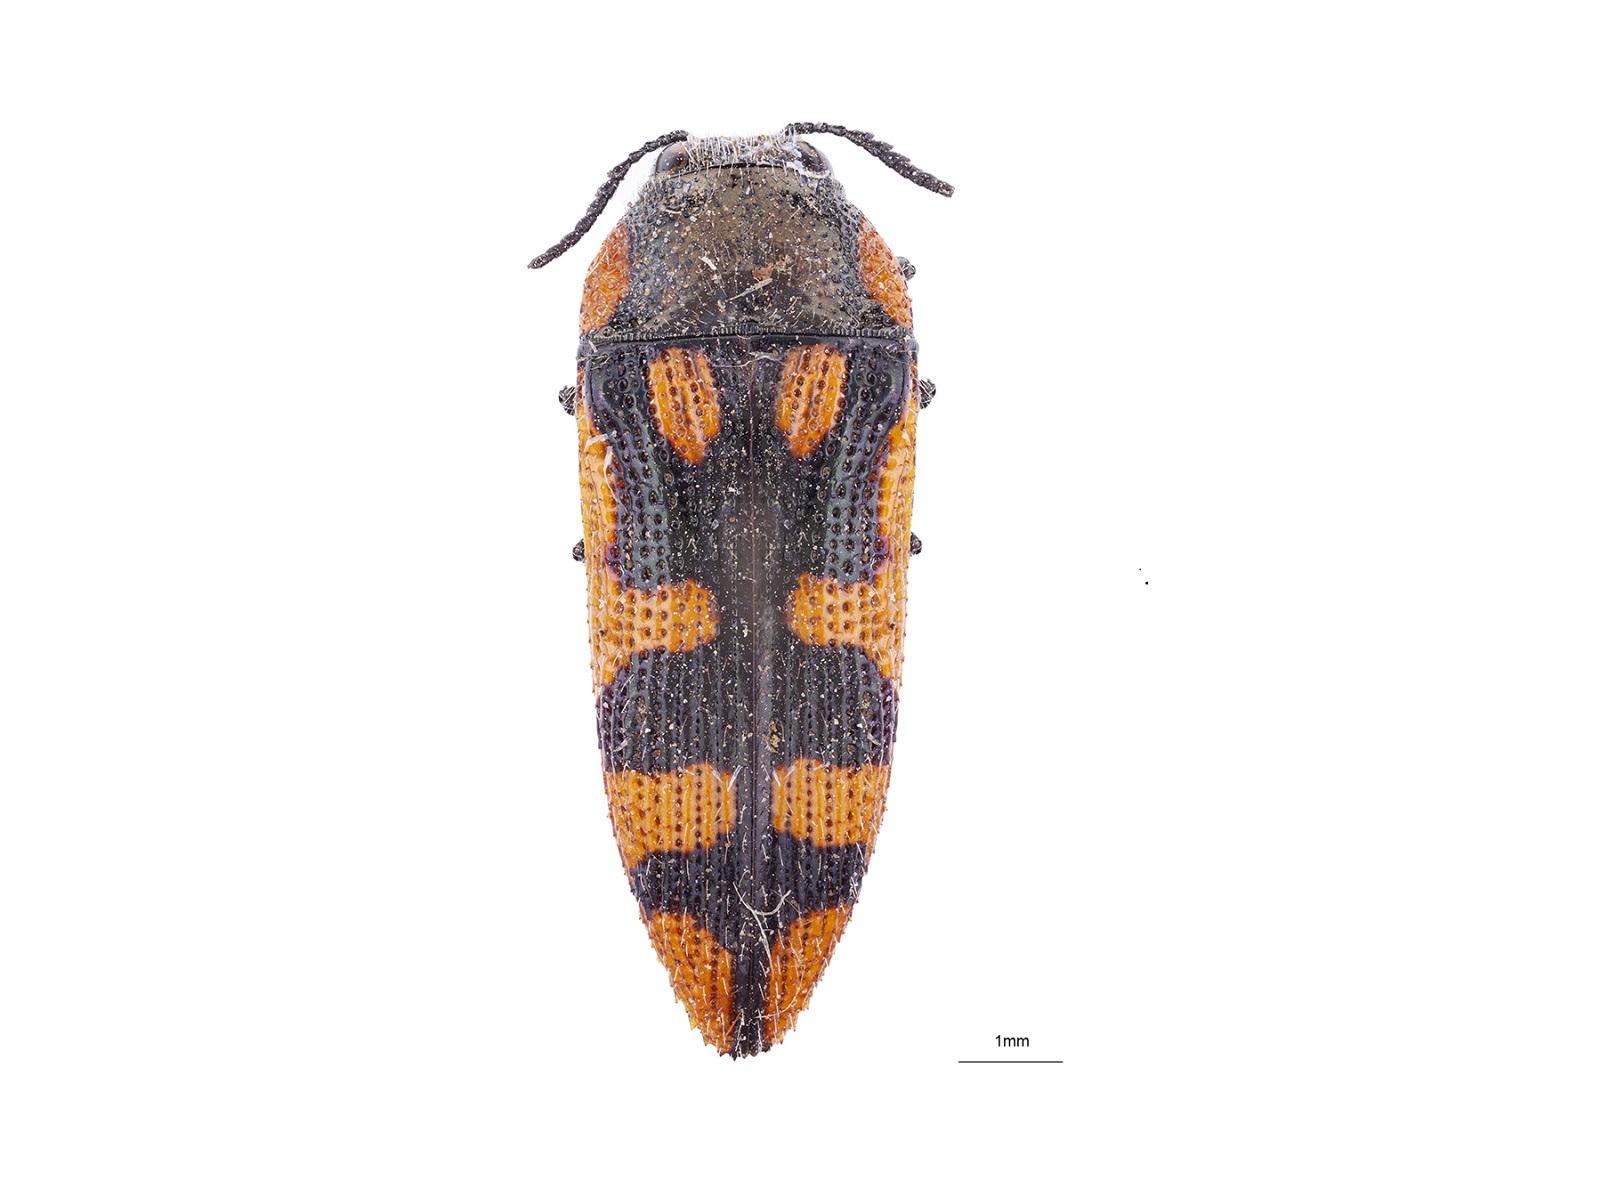 Acmaeodera xanthosticta Laporte & Gory, 1835